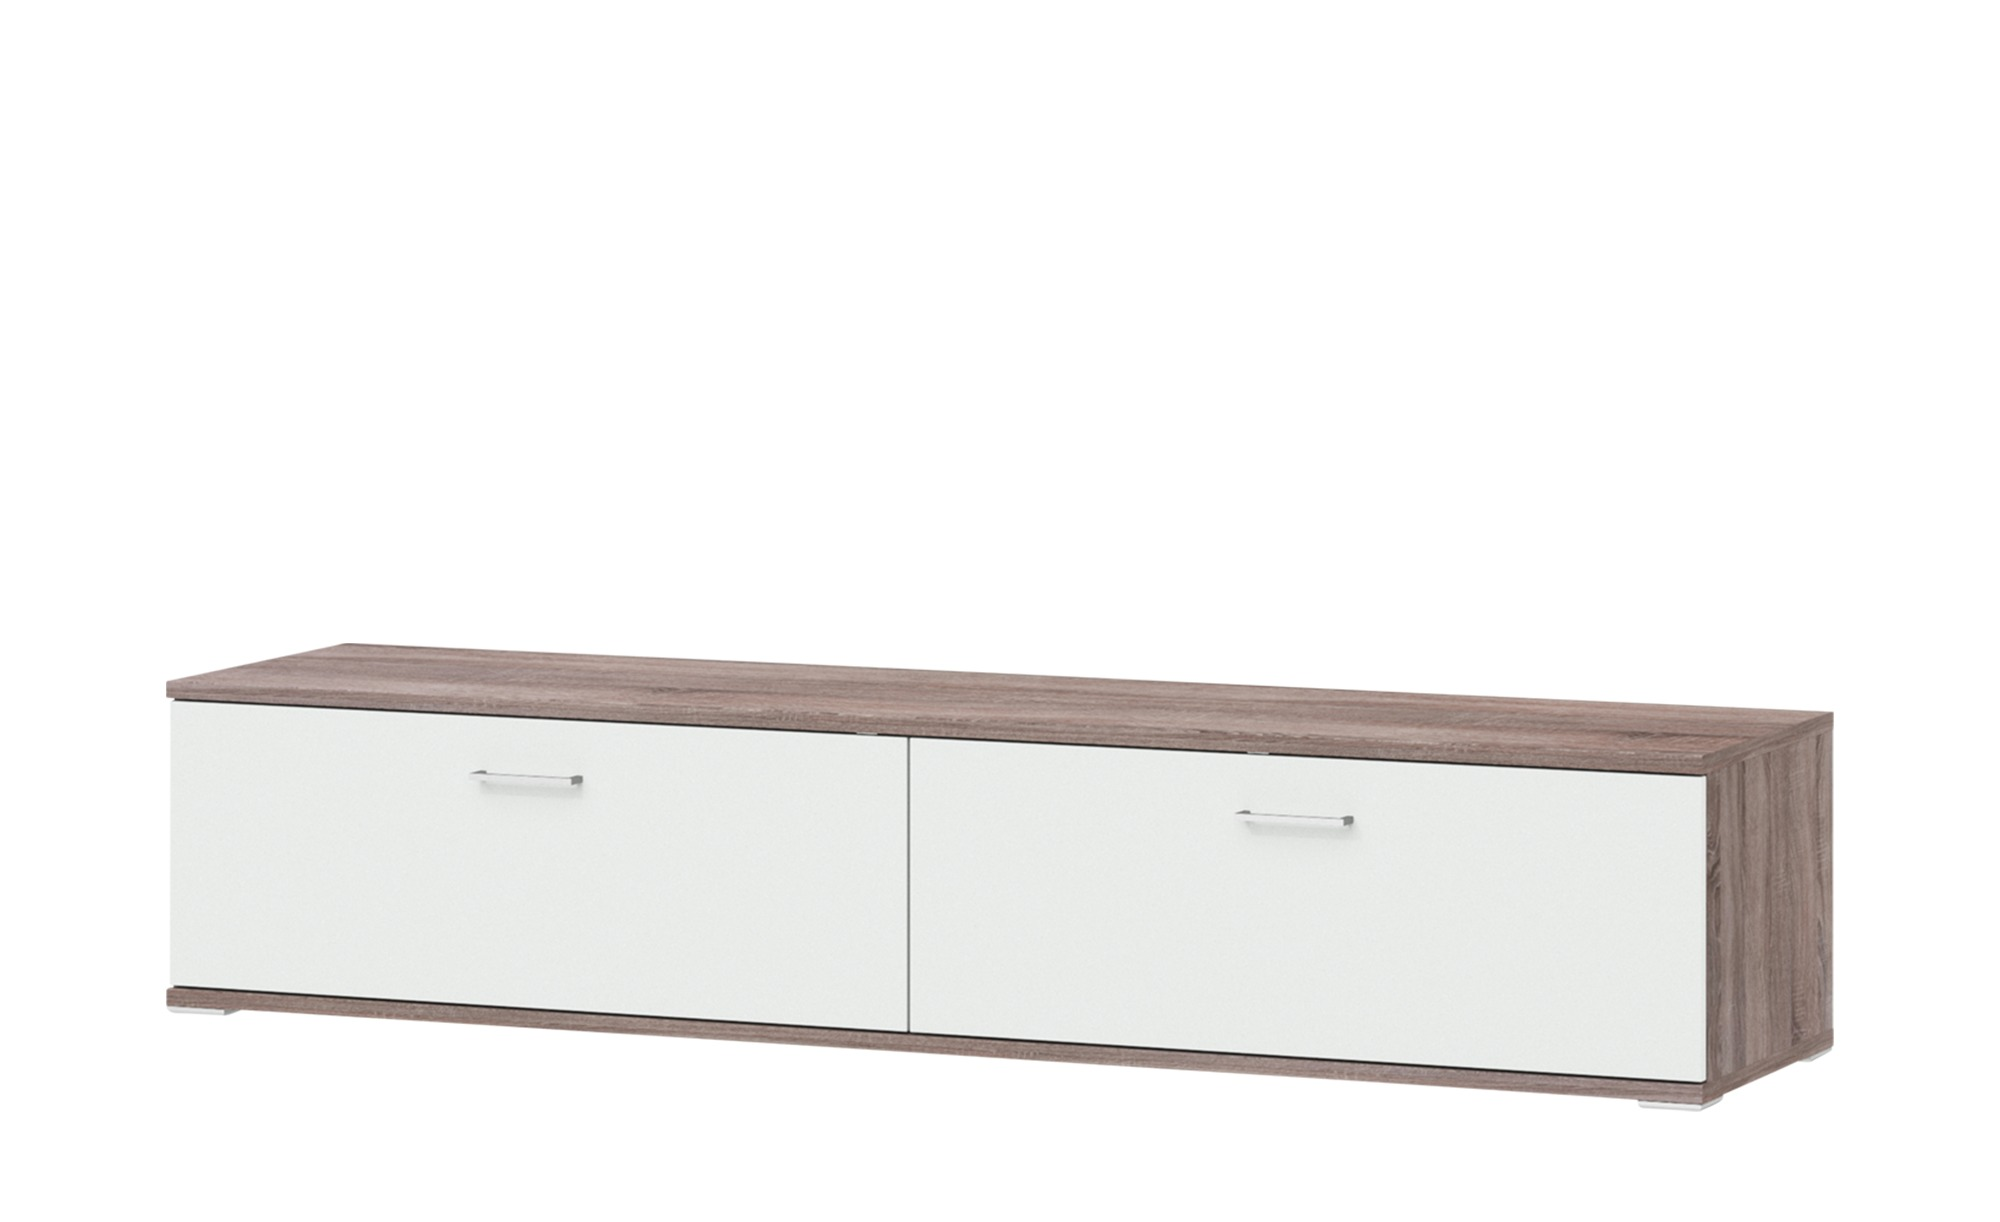 uno Lowboard  Onyx ¦ Maße (cm): B: 201 H: 42 T: 49 Kommoden & Sideboards > Lowboards - Höffner   Wohnzimmer > Schränke > Lowboards   Holzwerkstoff - Holz   Möbel Höffner DE